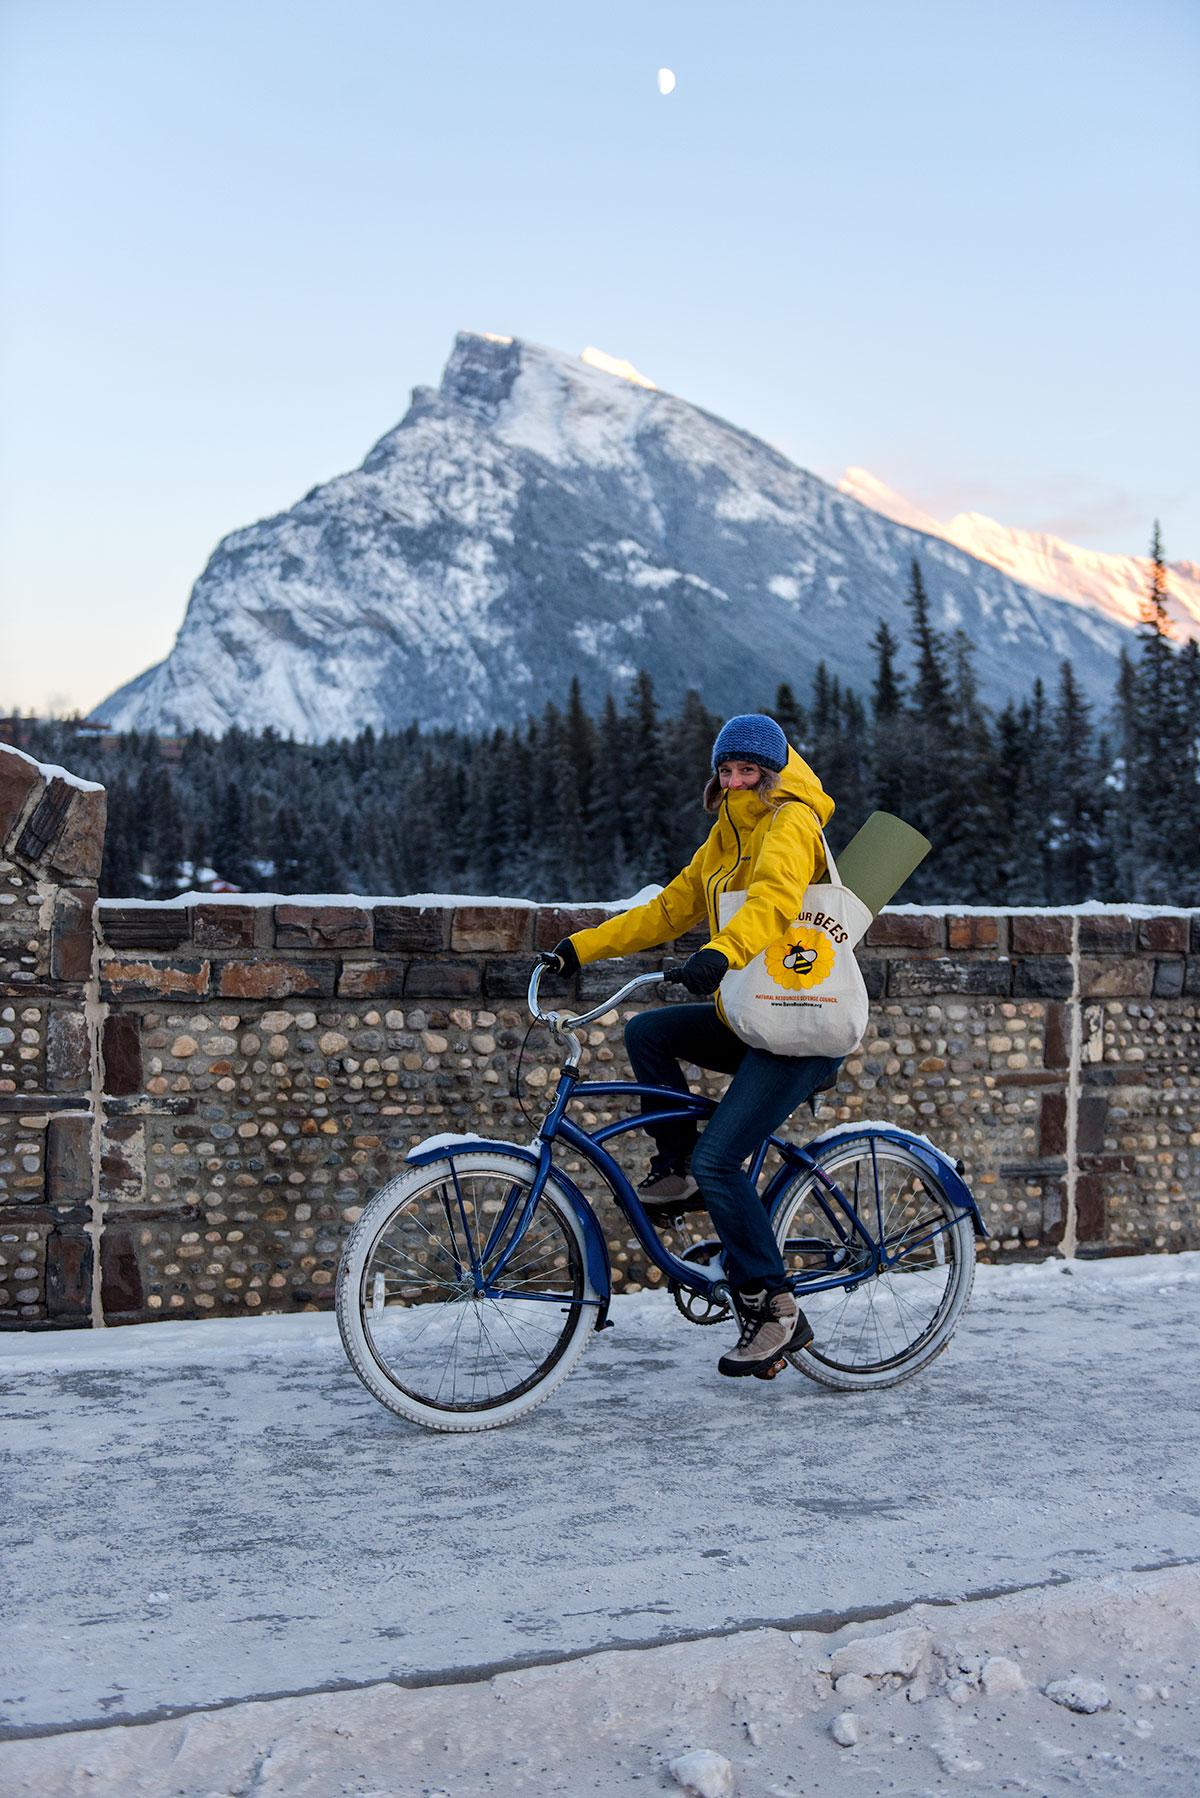 austin-trigg-patagonia-banff-alberta-winter-bicycle-lifestyle-mt-rundle-cold-yoga-adventure.jpg